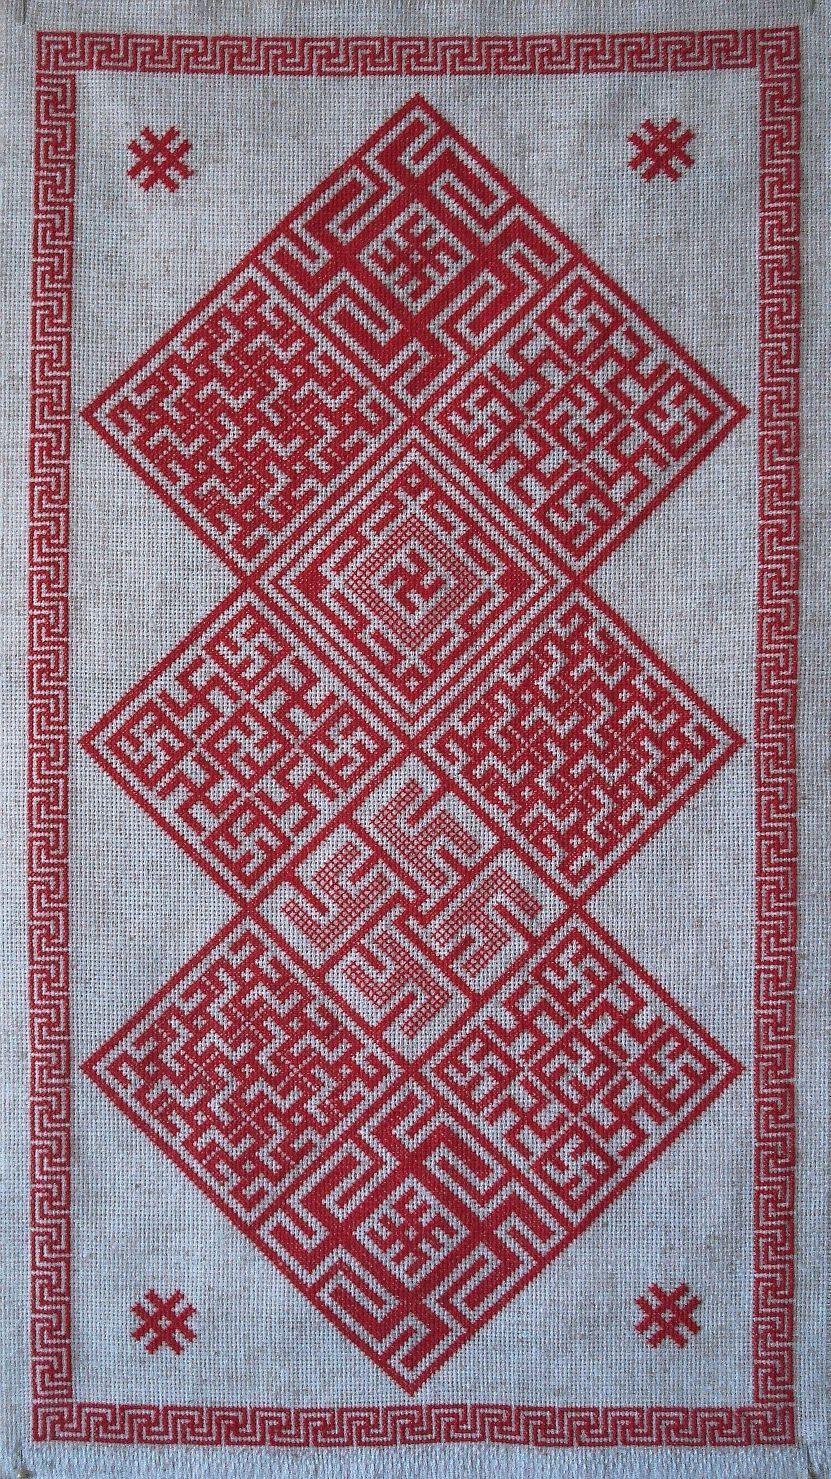 Smolensk embroidery